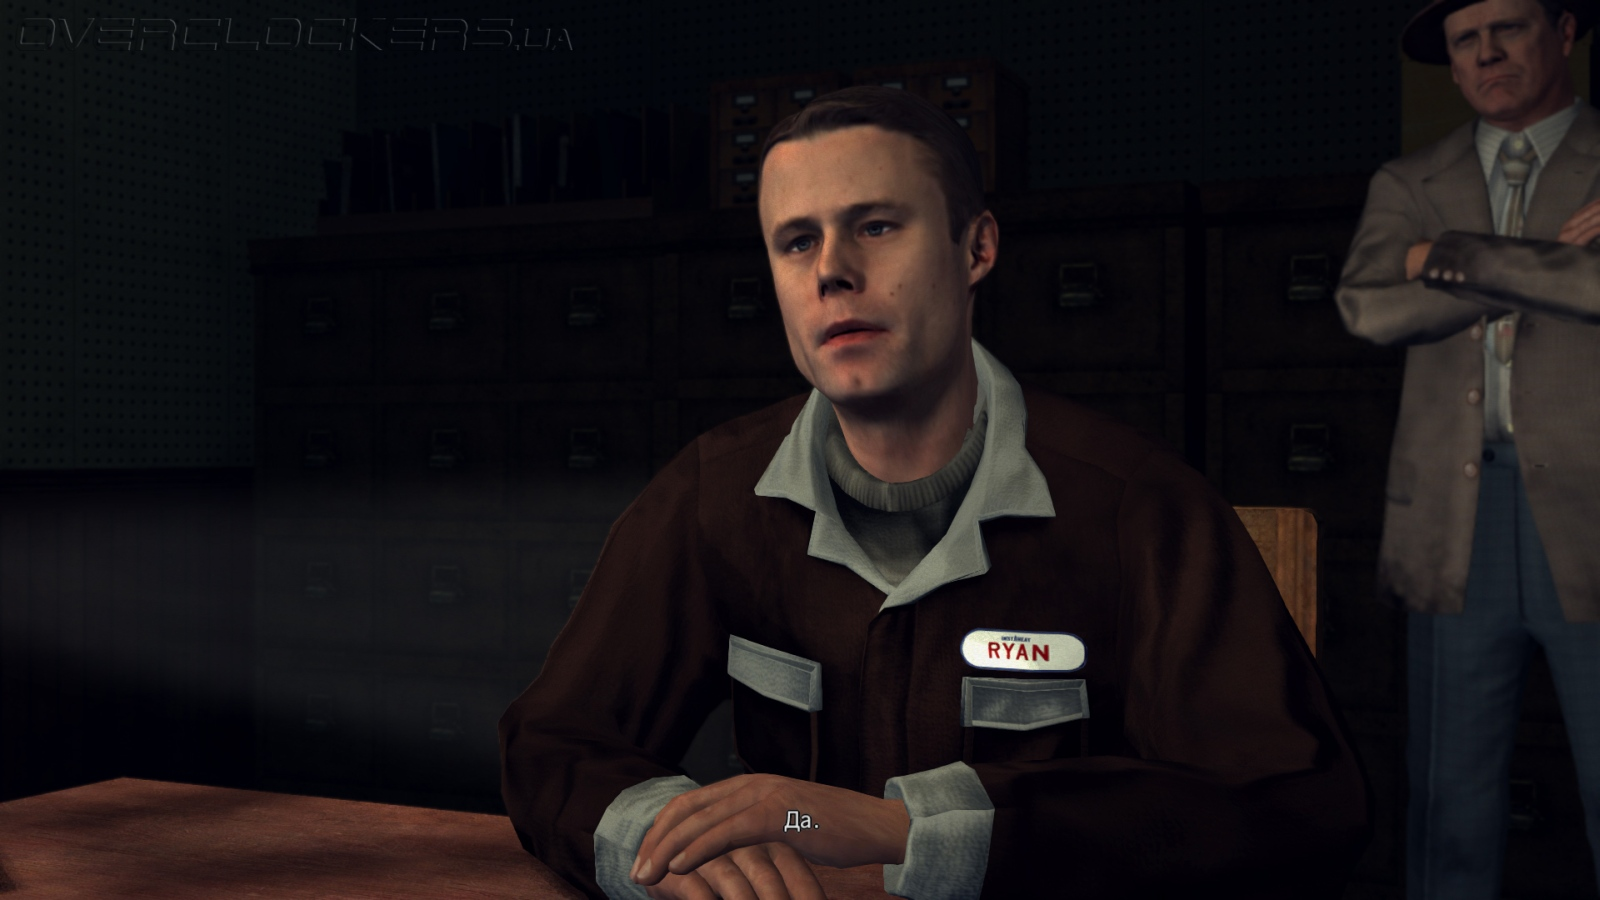 Игры - L.A. Noire. Тайны Лос-Анджелеса | overclockers.ua